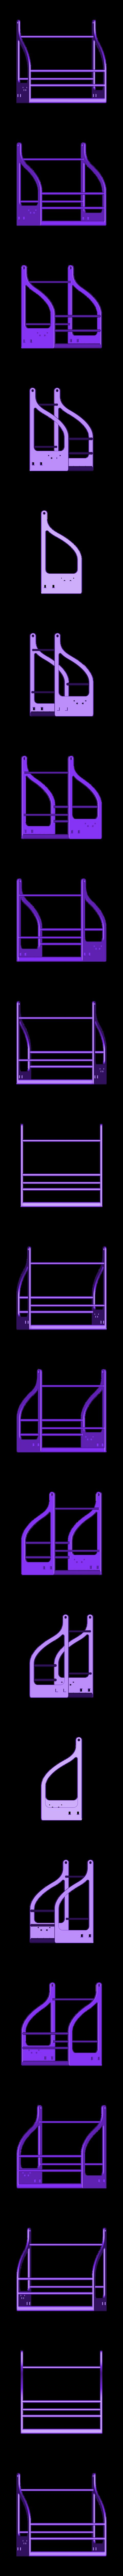 Pièce1 - Copie1.STL Download free STL file Shower shampoo holder • 3D printable template, CedricRoy